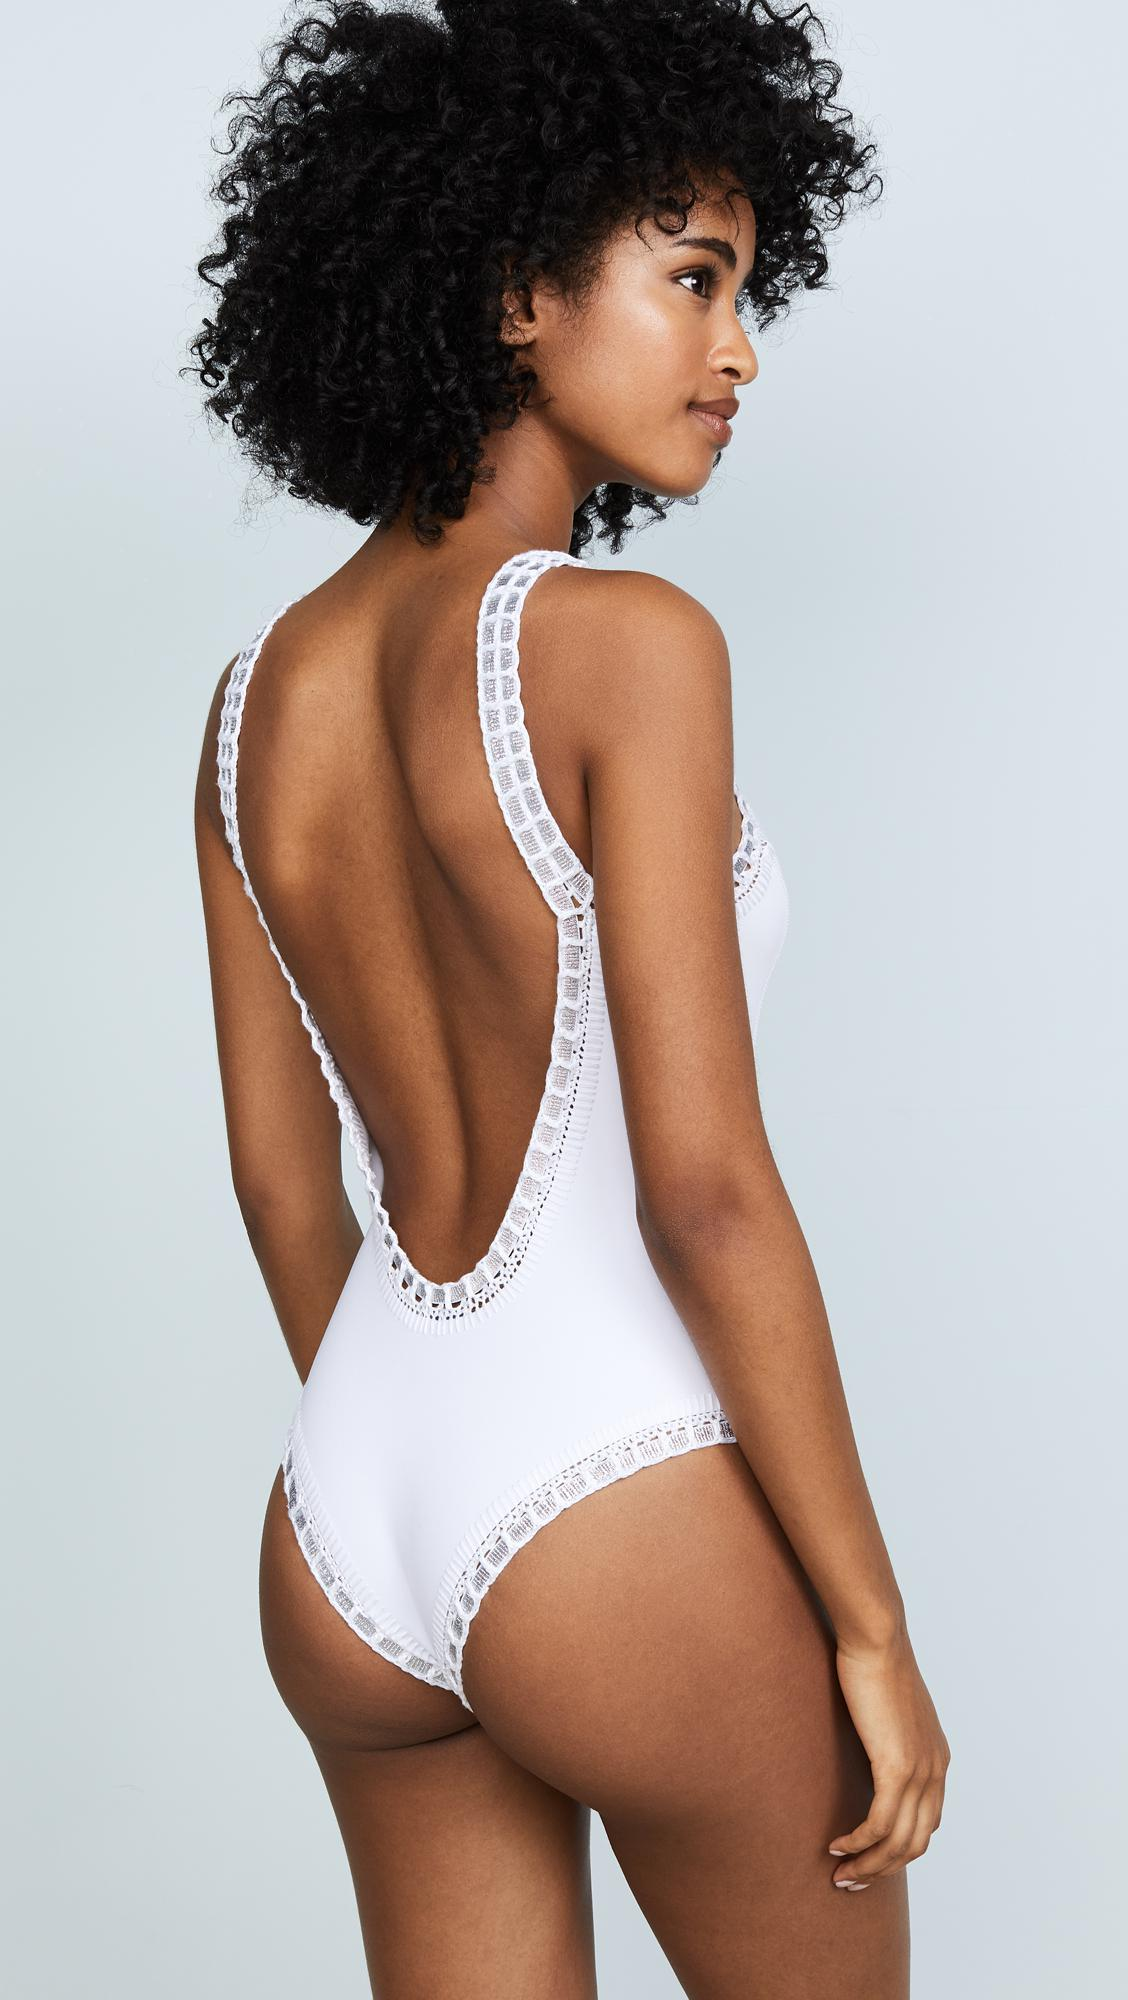 Bikini Veronica Valentine naked (33 photos), Sexy, Fappening, Twitter, underwear 2018